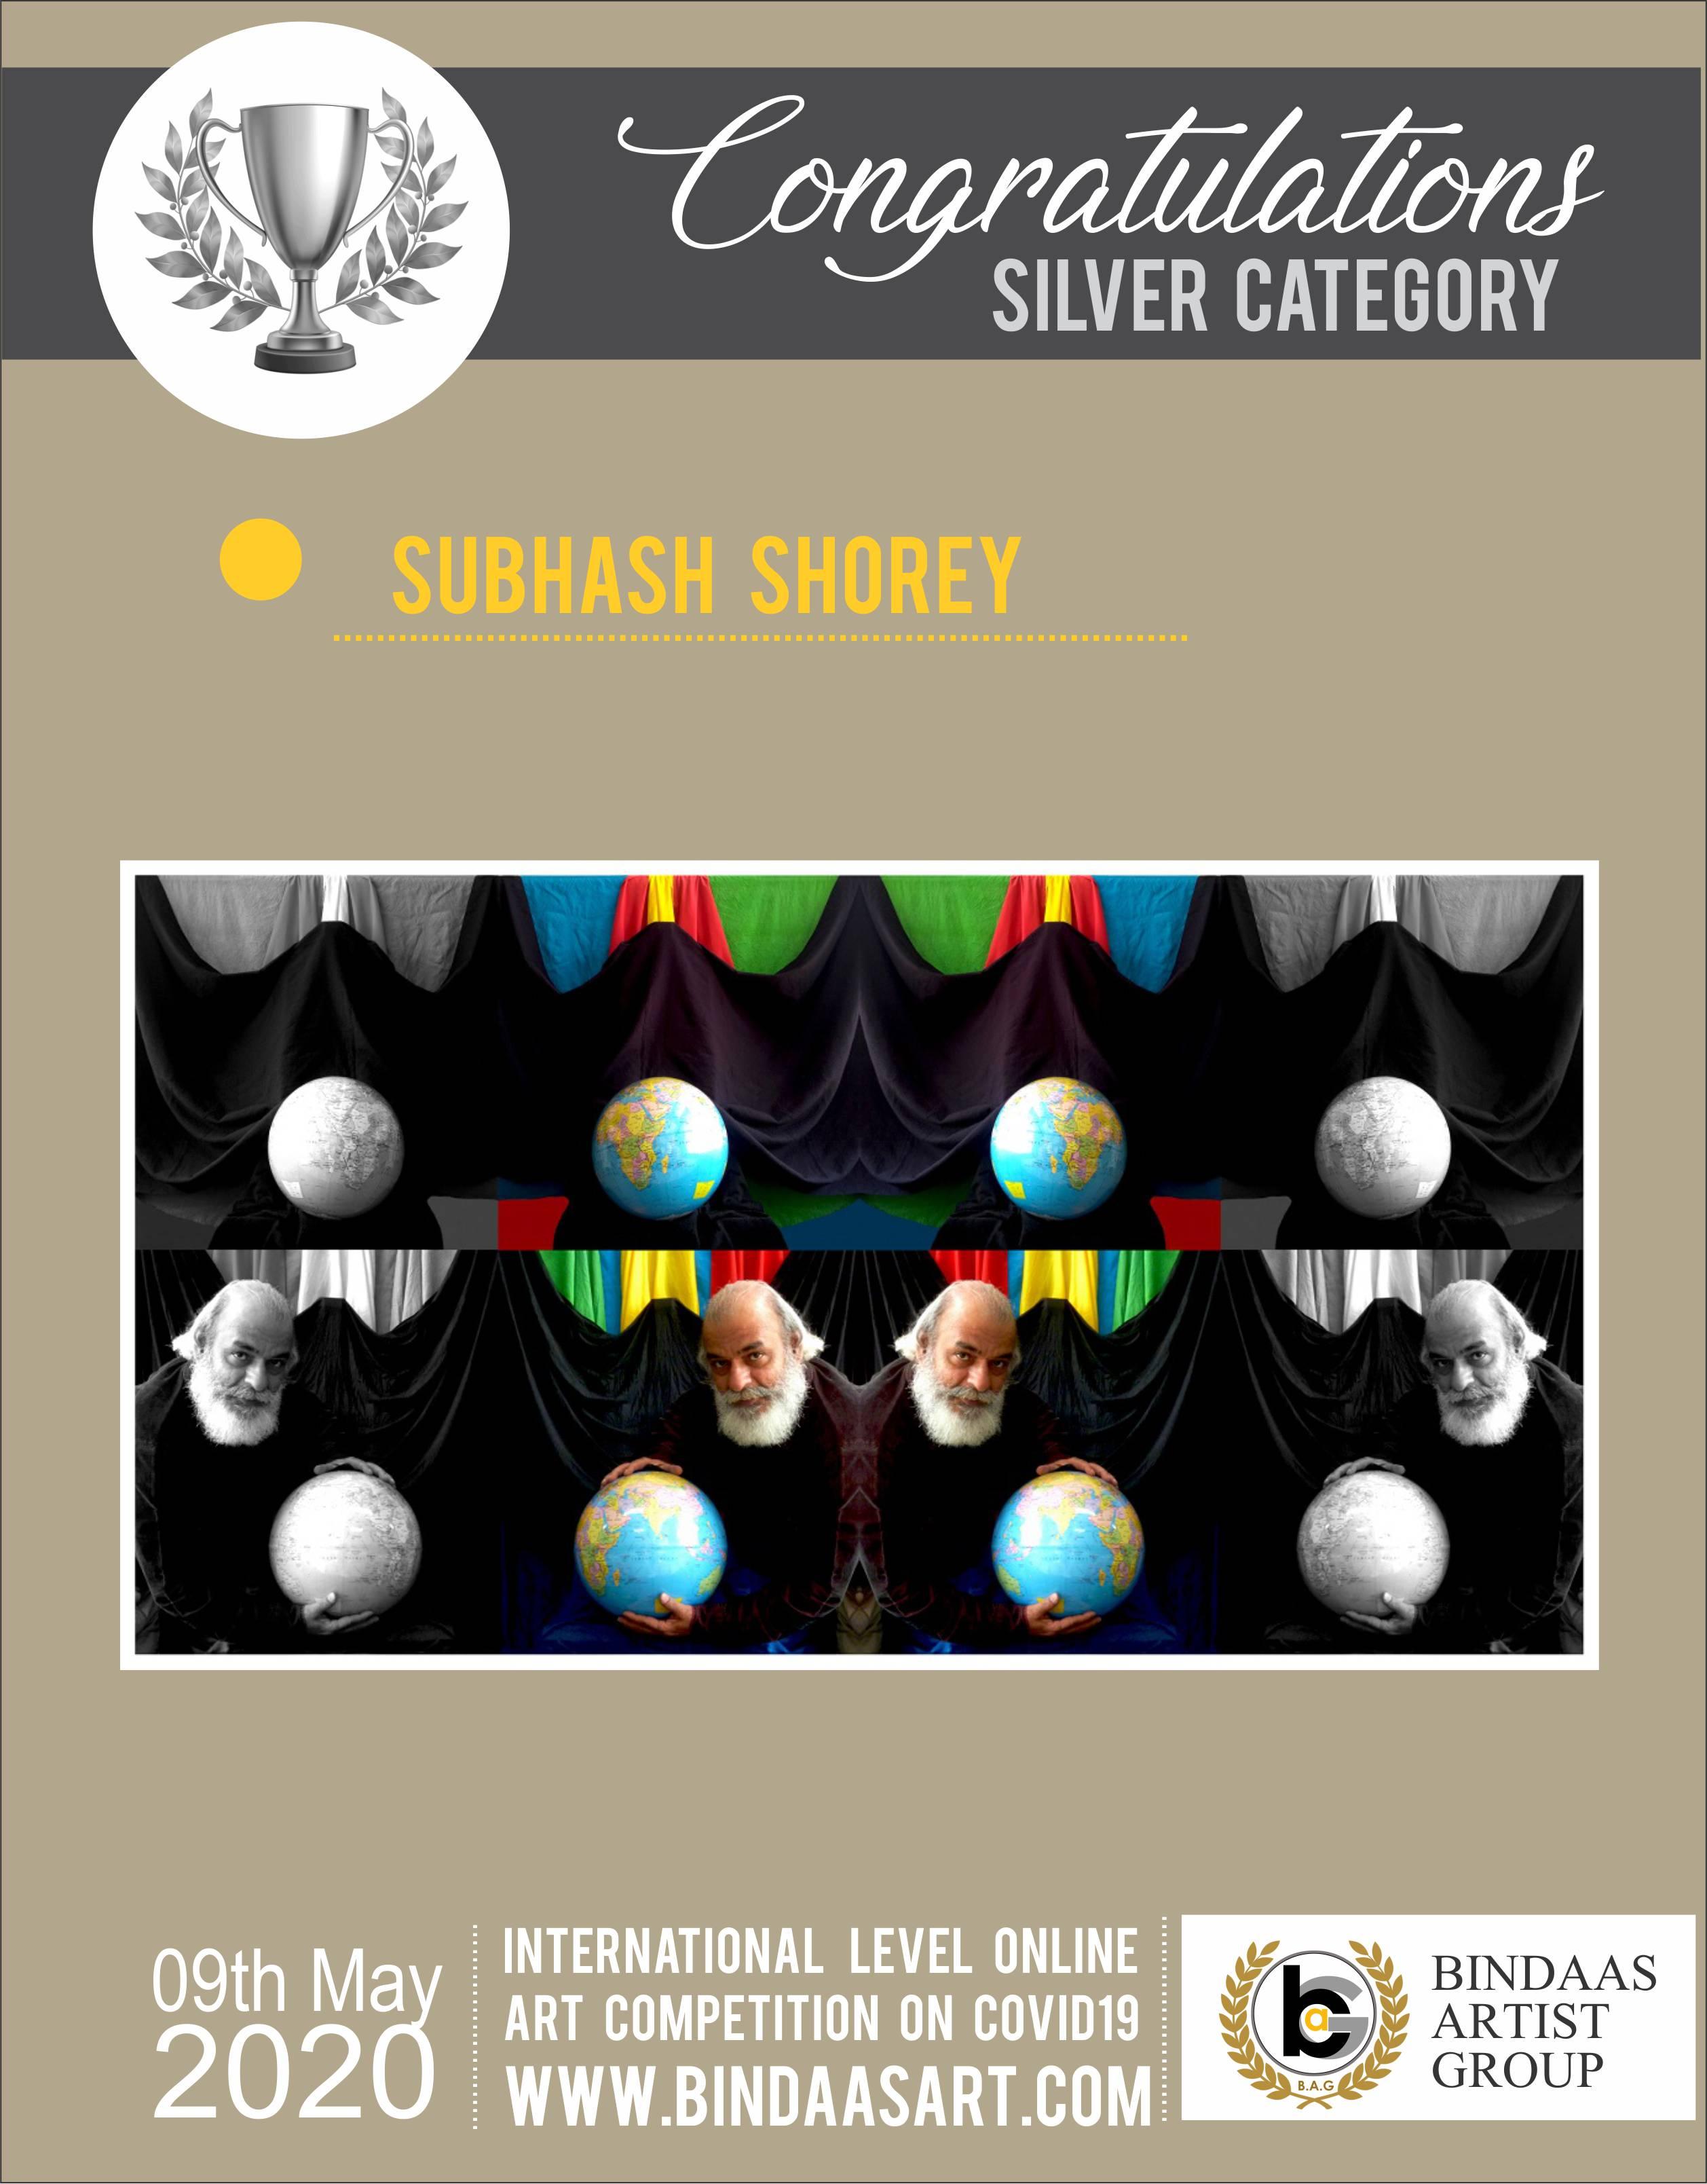 Subhash shorey